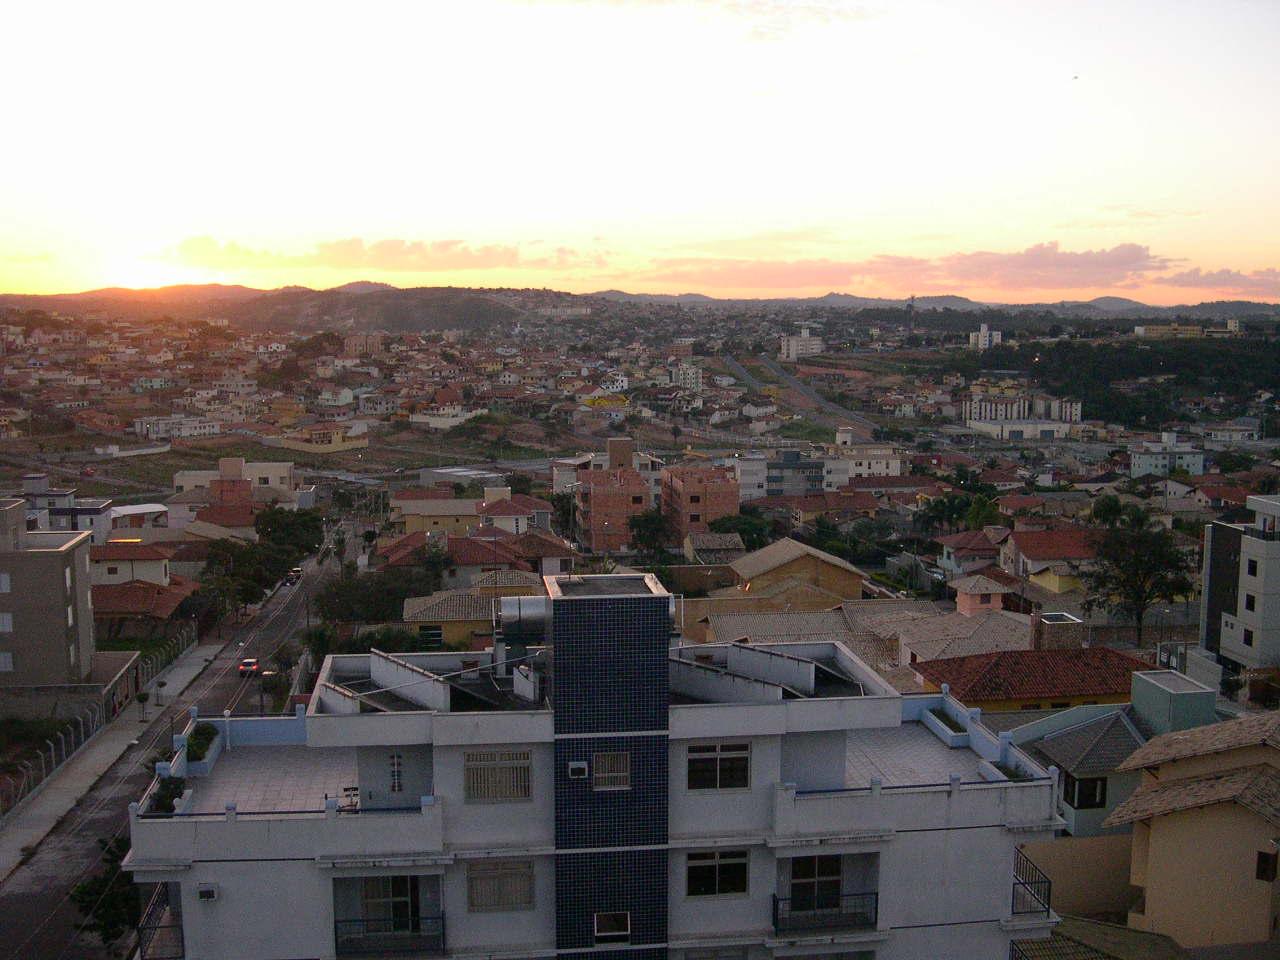 Belo Horizonte, Minas Gerais, Brazil - photo by Jay Woodworth under CC BY 2.0